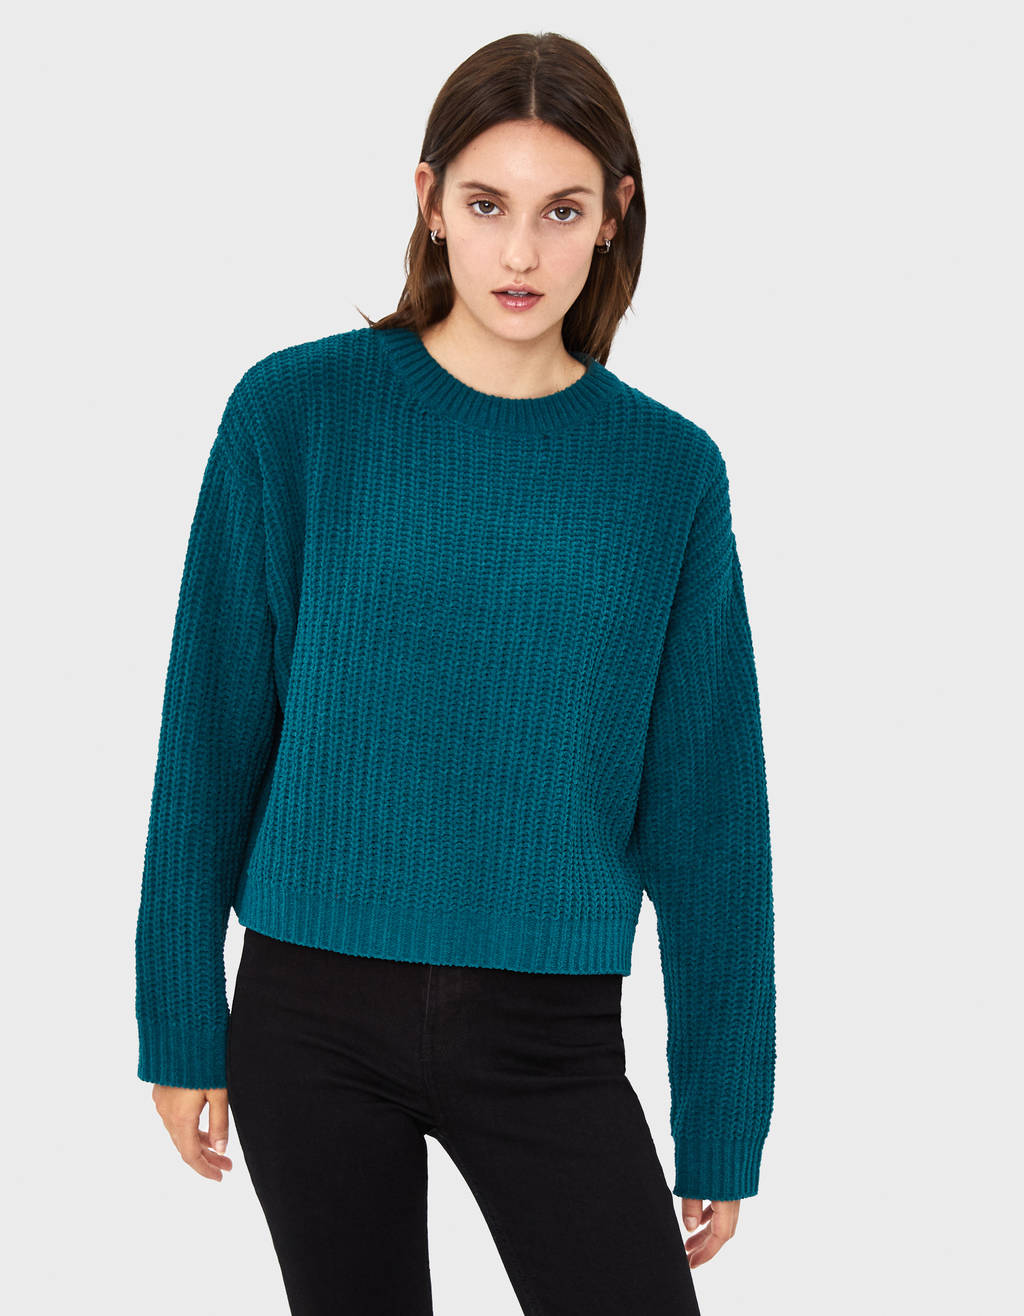 Chenille sweater